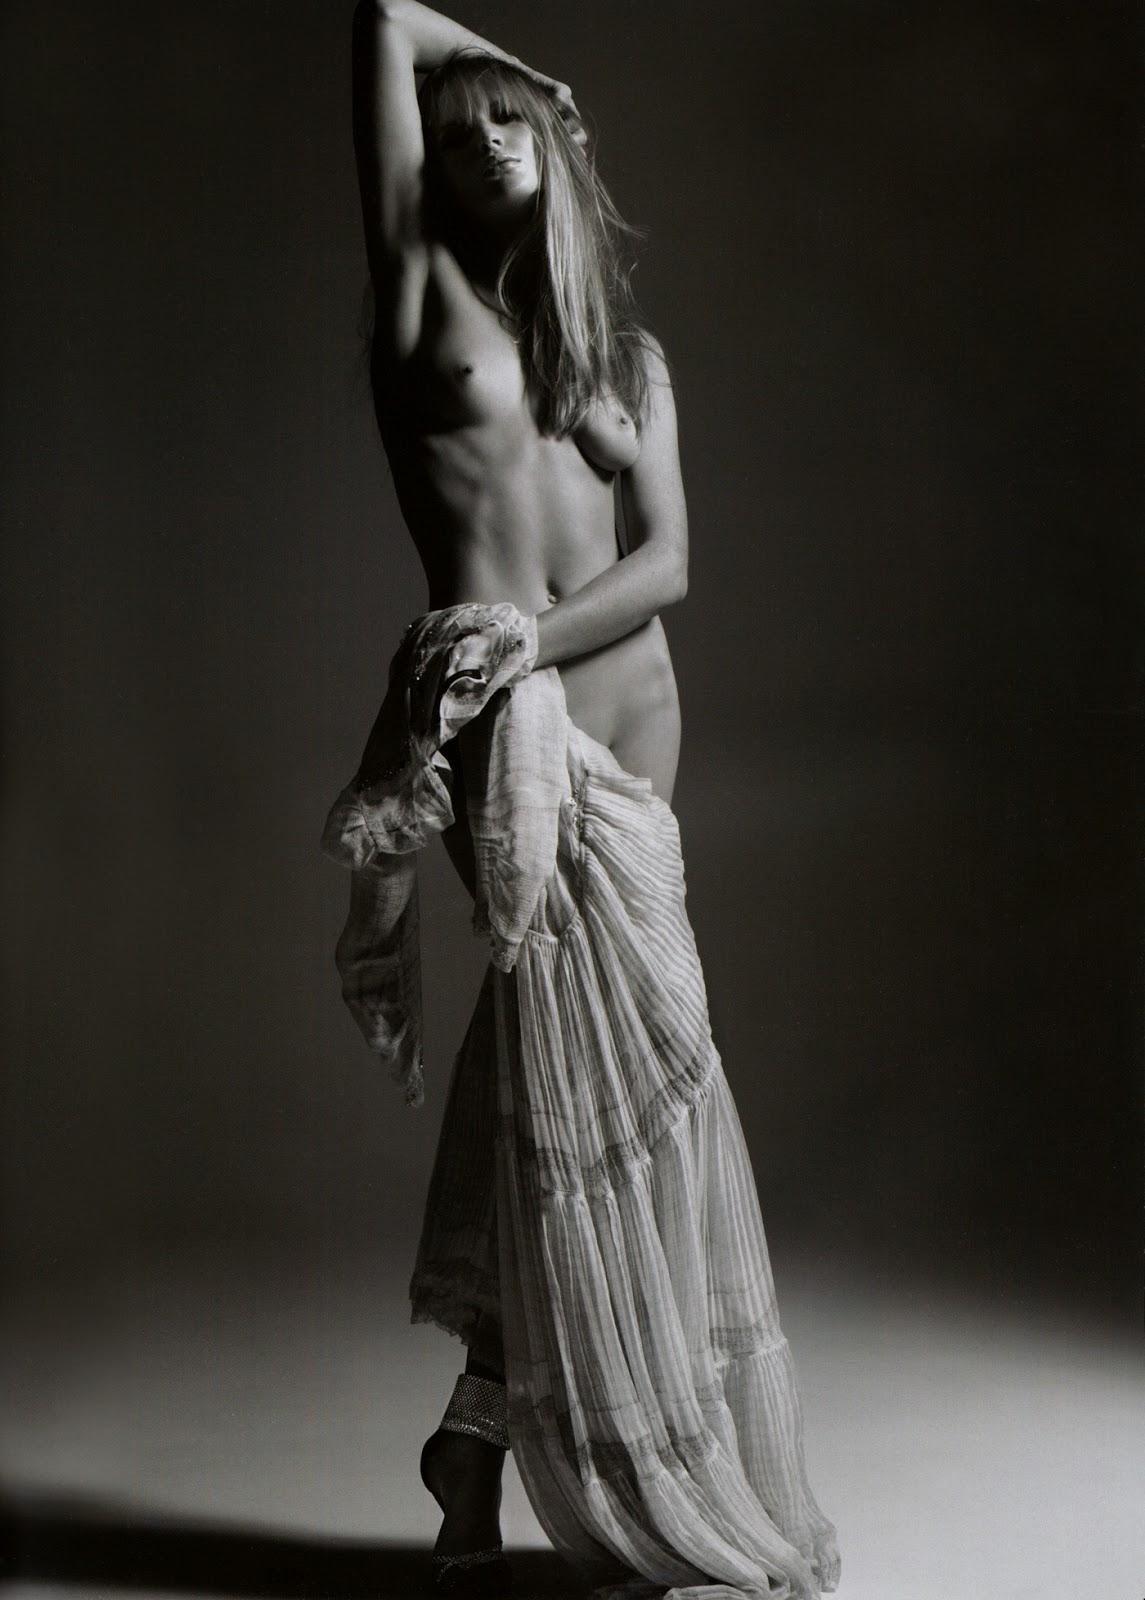 Anne vyalitsyna topless